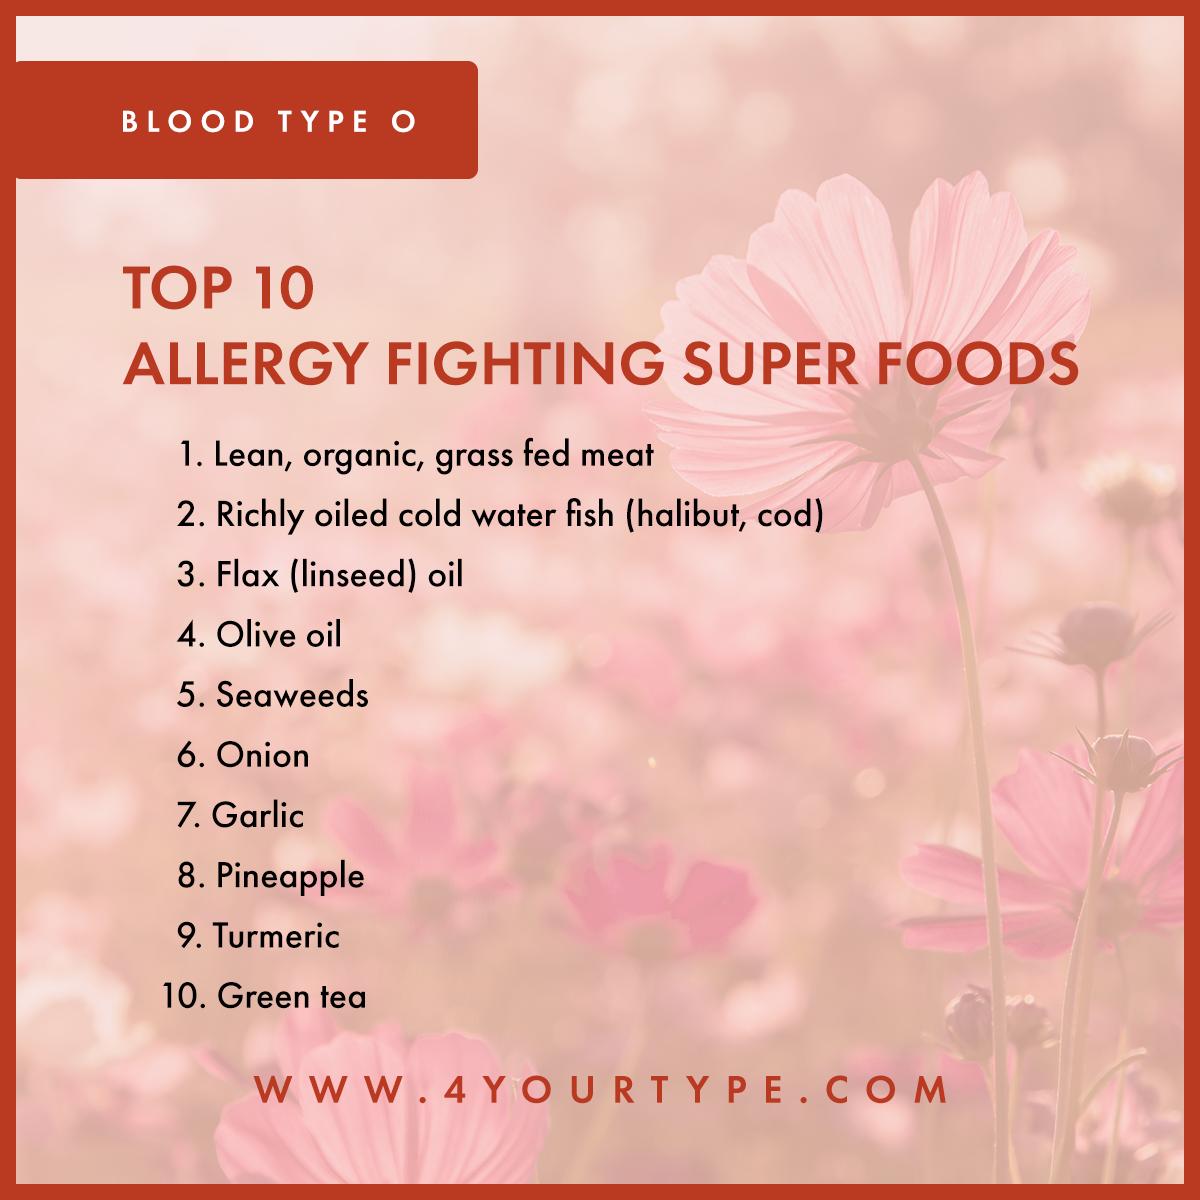 Blood Type O - Seasonal Allergies